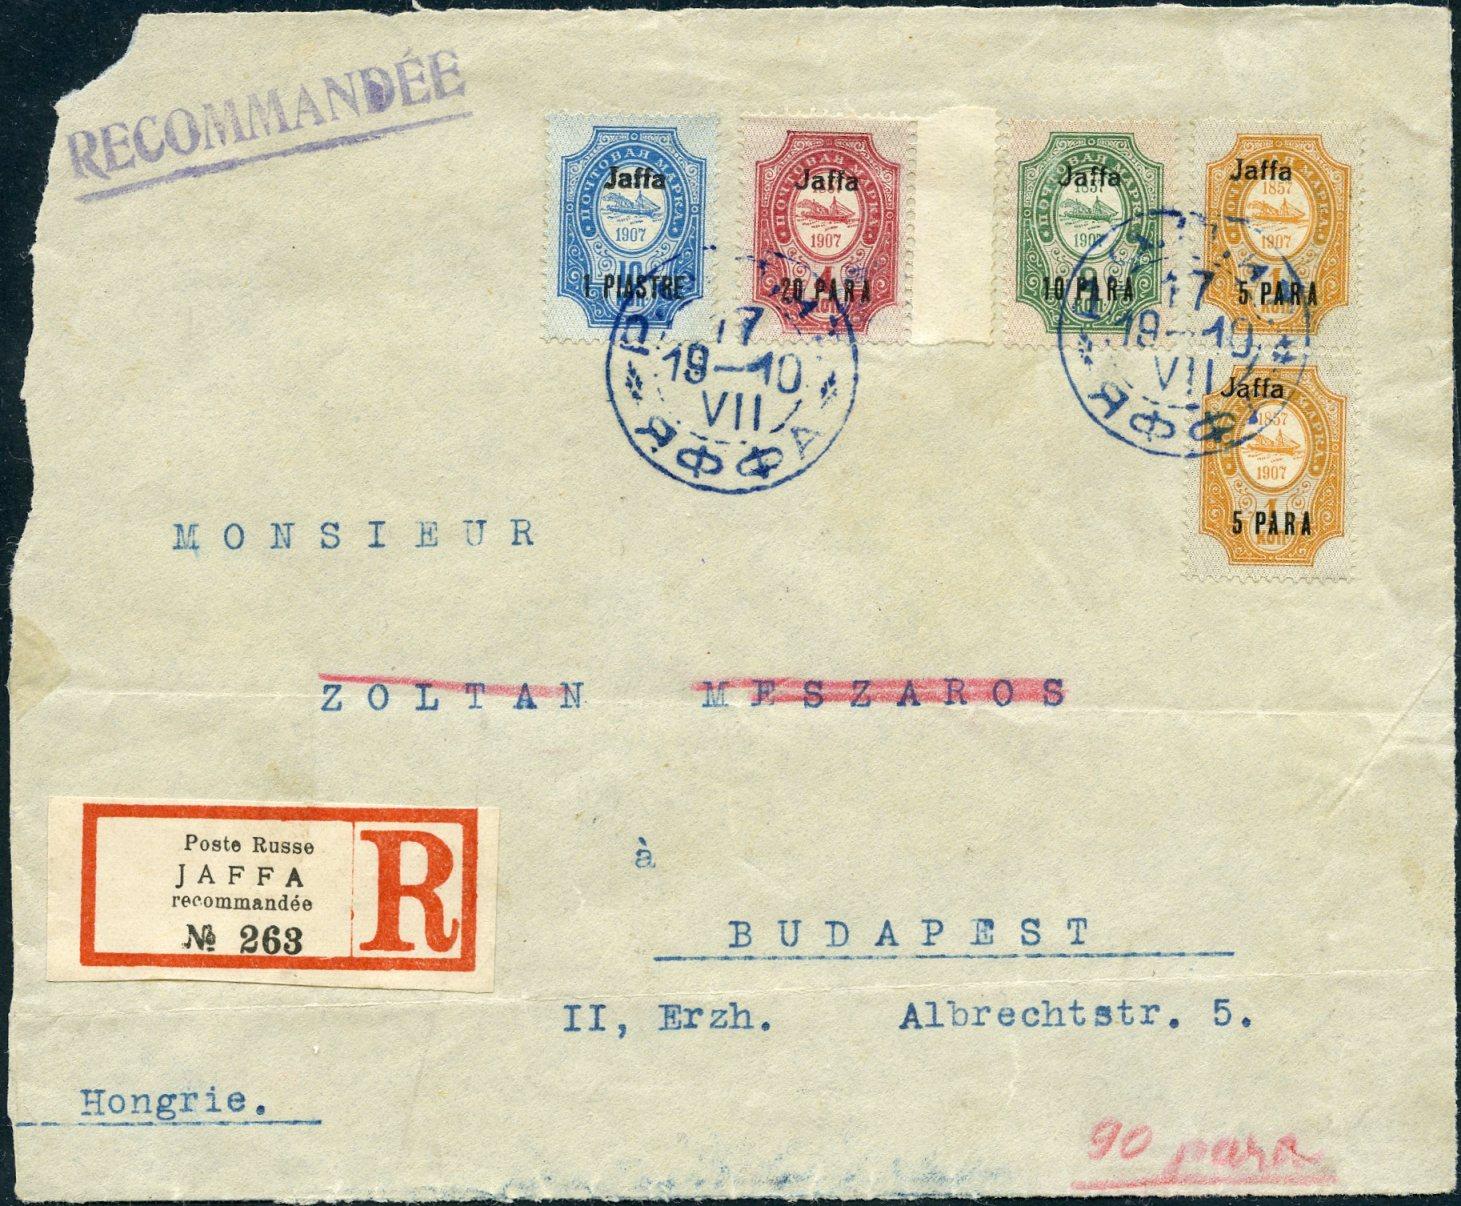 Lot 23 - PALESTINE FORERUNNERS AUSTRIAN POST  -  Tel Aviv Stamps Ltd. Auction #50